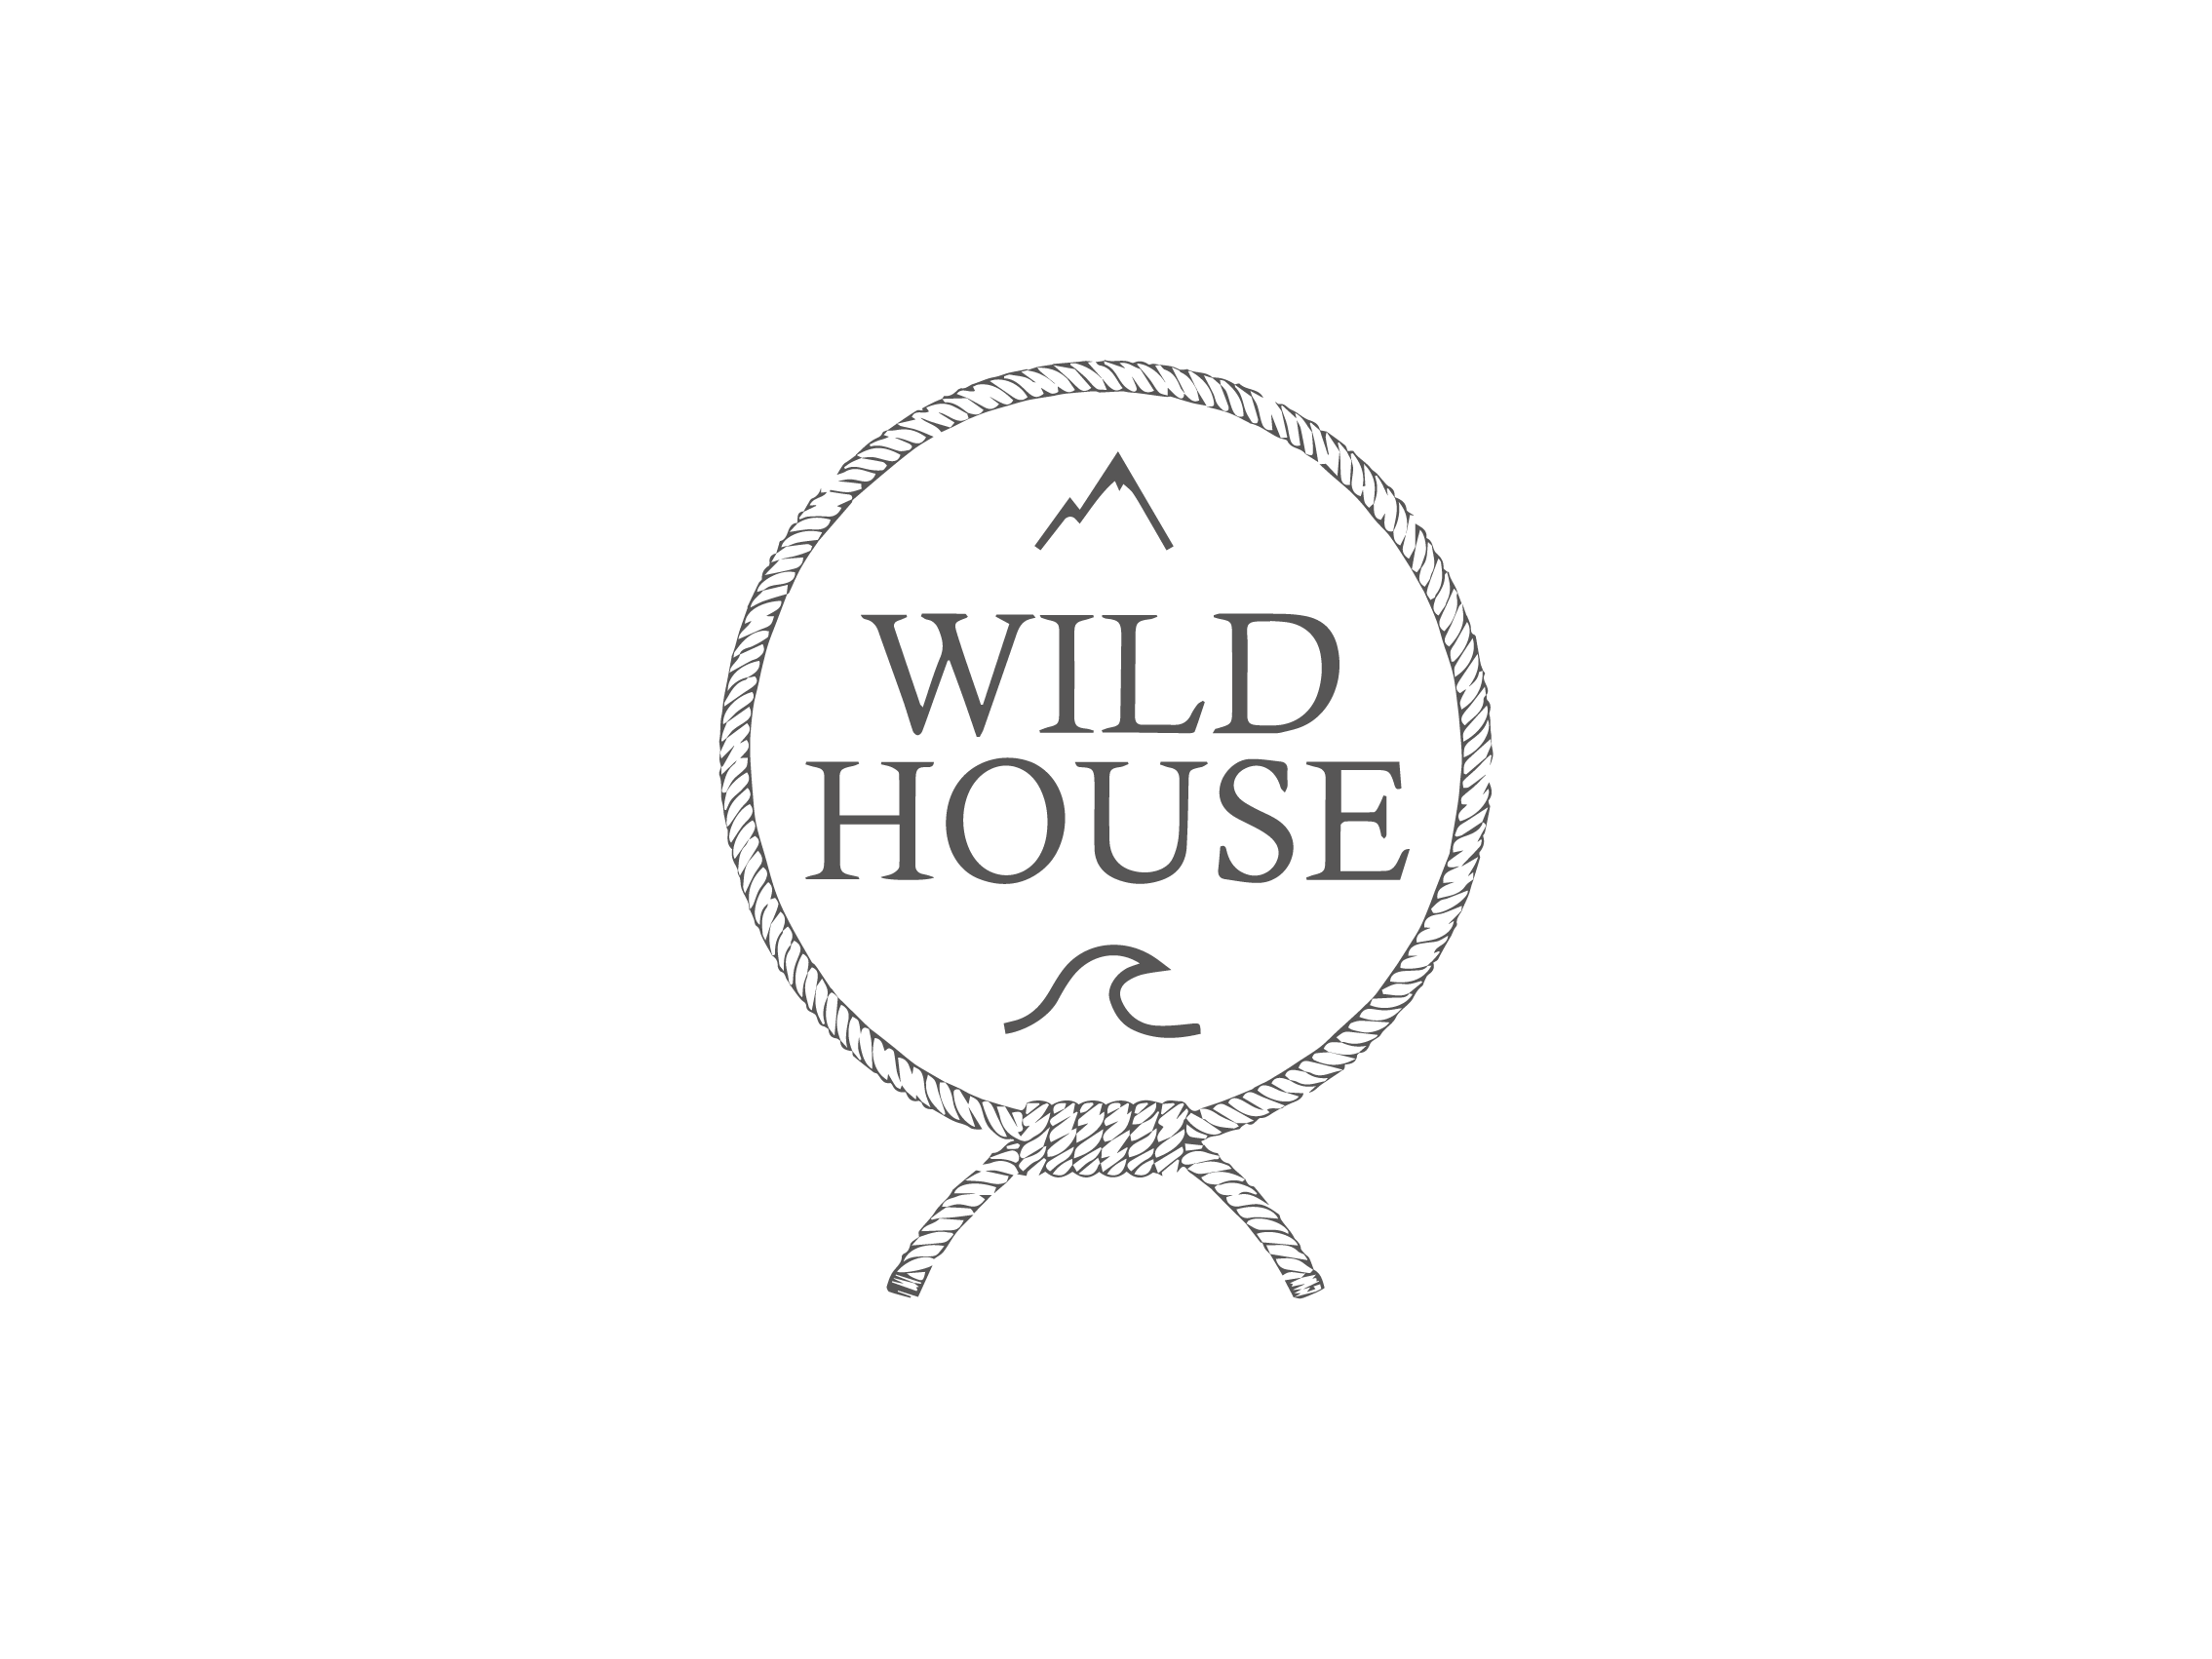 Wild house - zápisníky, sešity